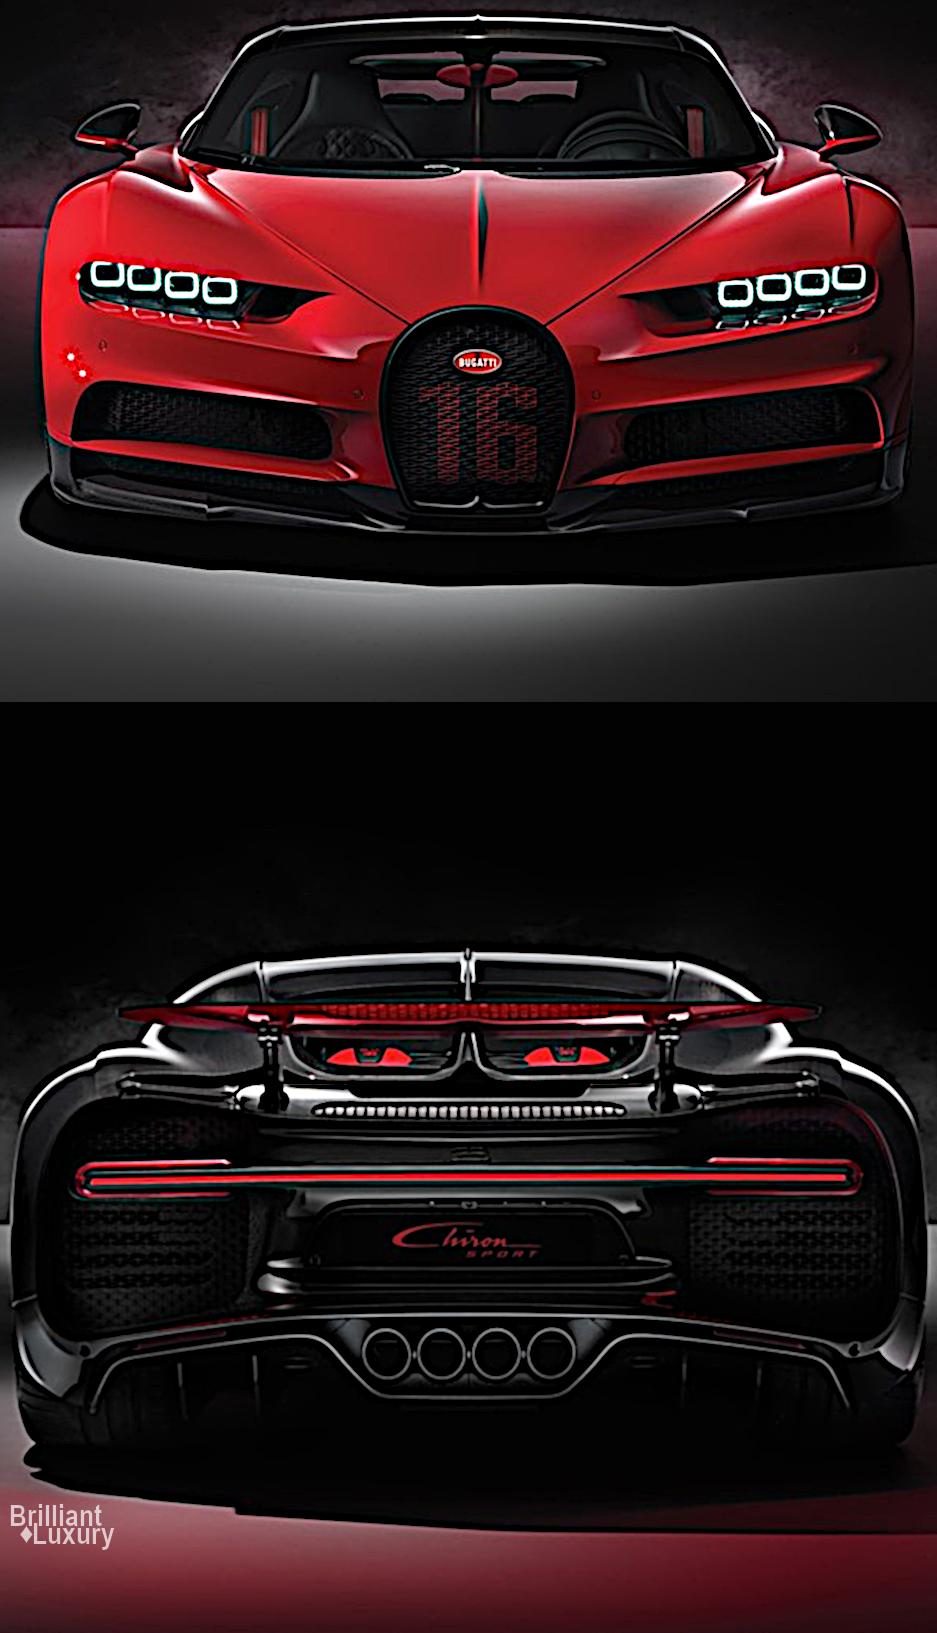 Brilliant LuxuryBugatti Chiron Sport 110 Ans special edition revealed